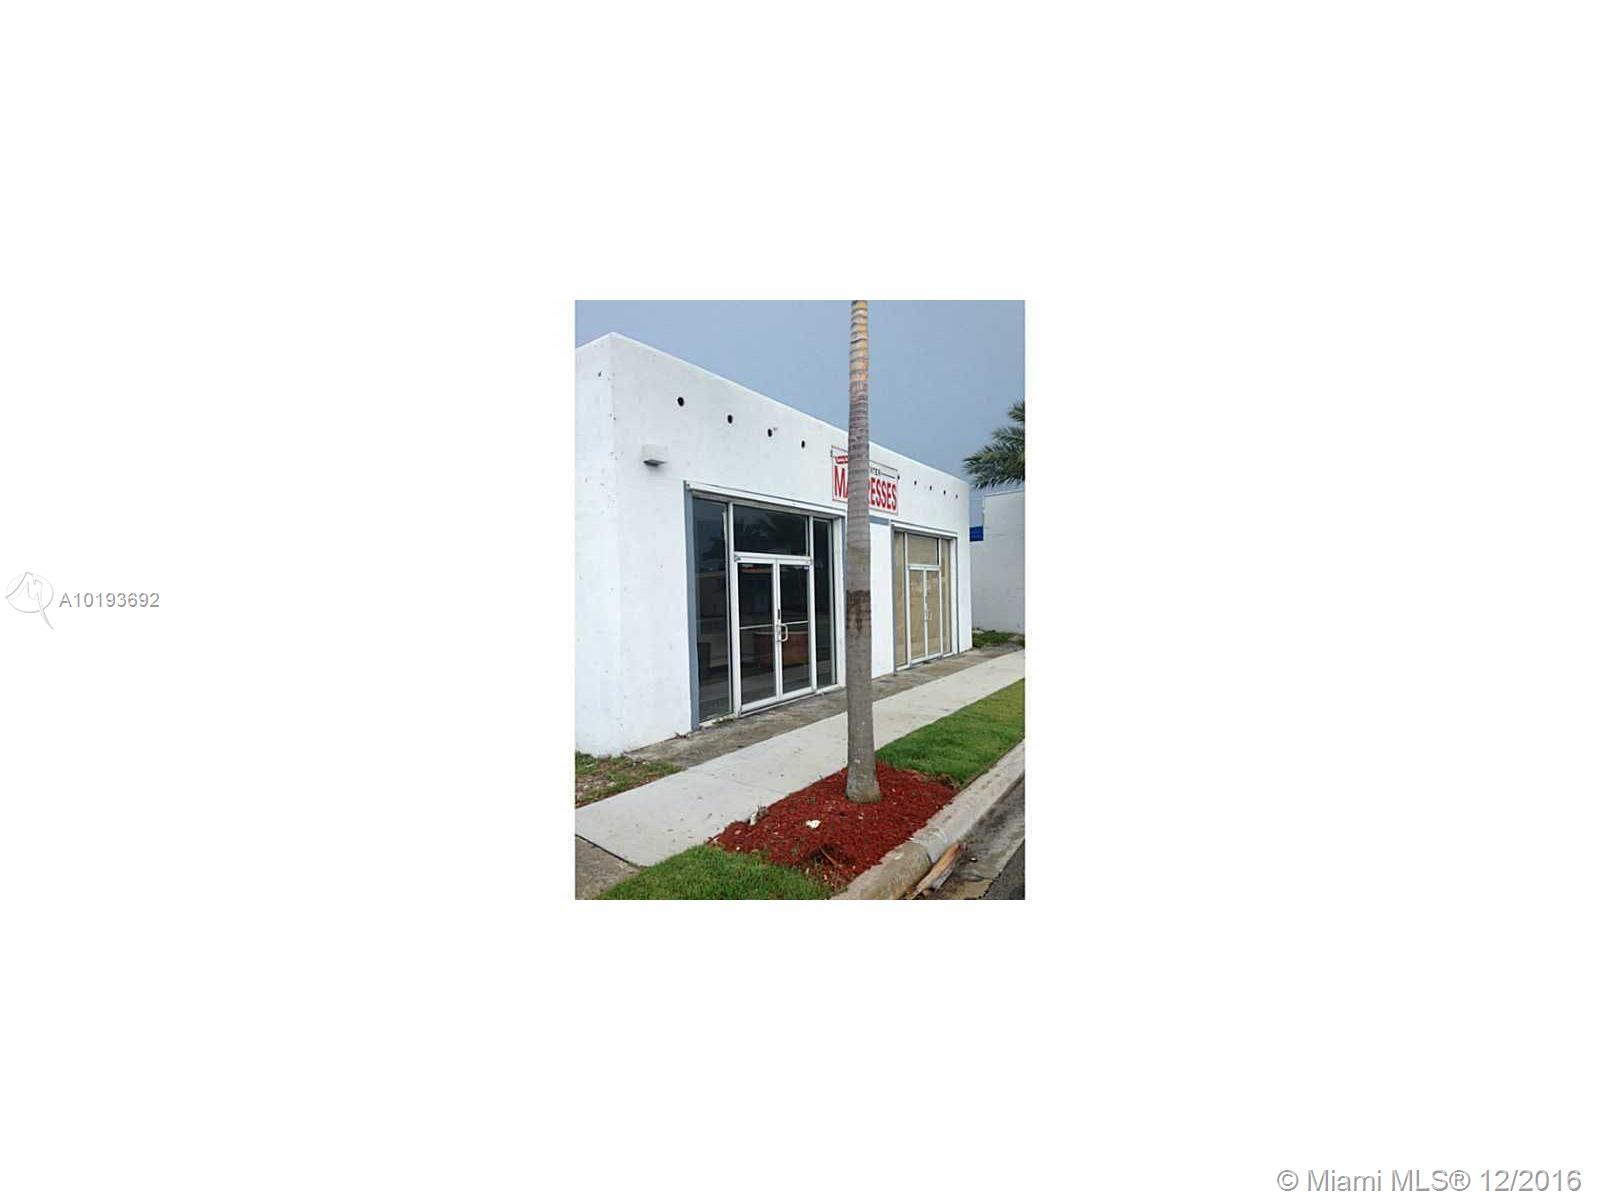 1419 S Federal Hwy, Dania Beach, FL 33004